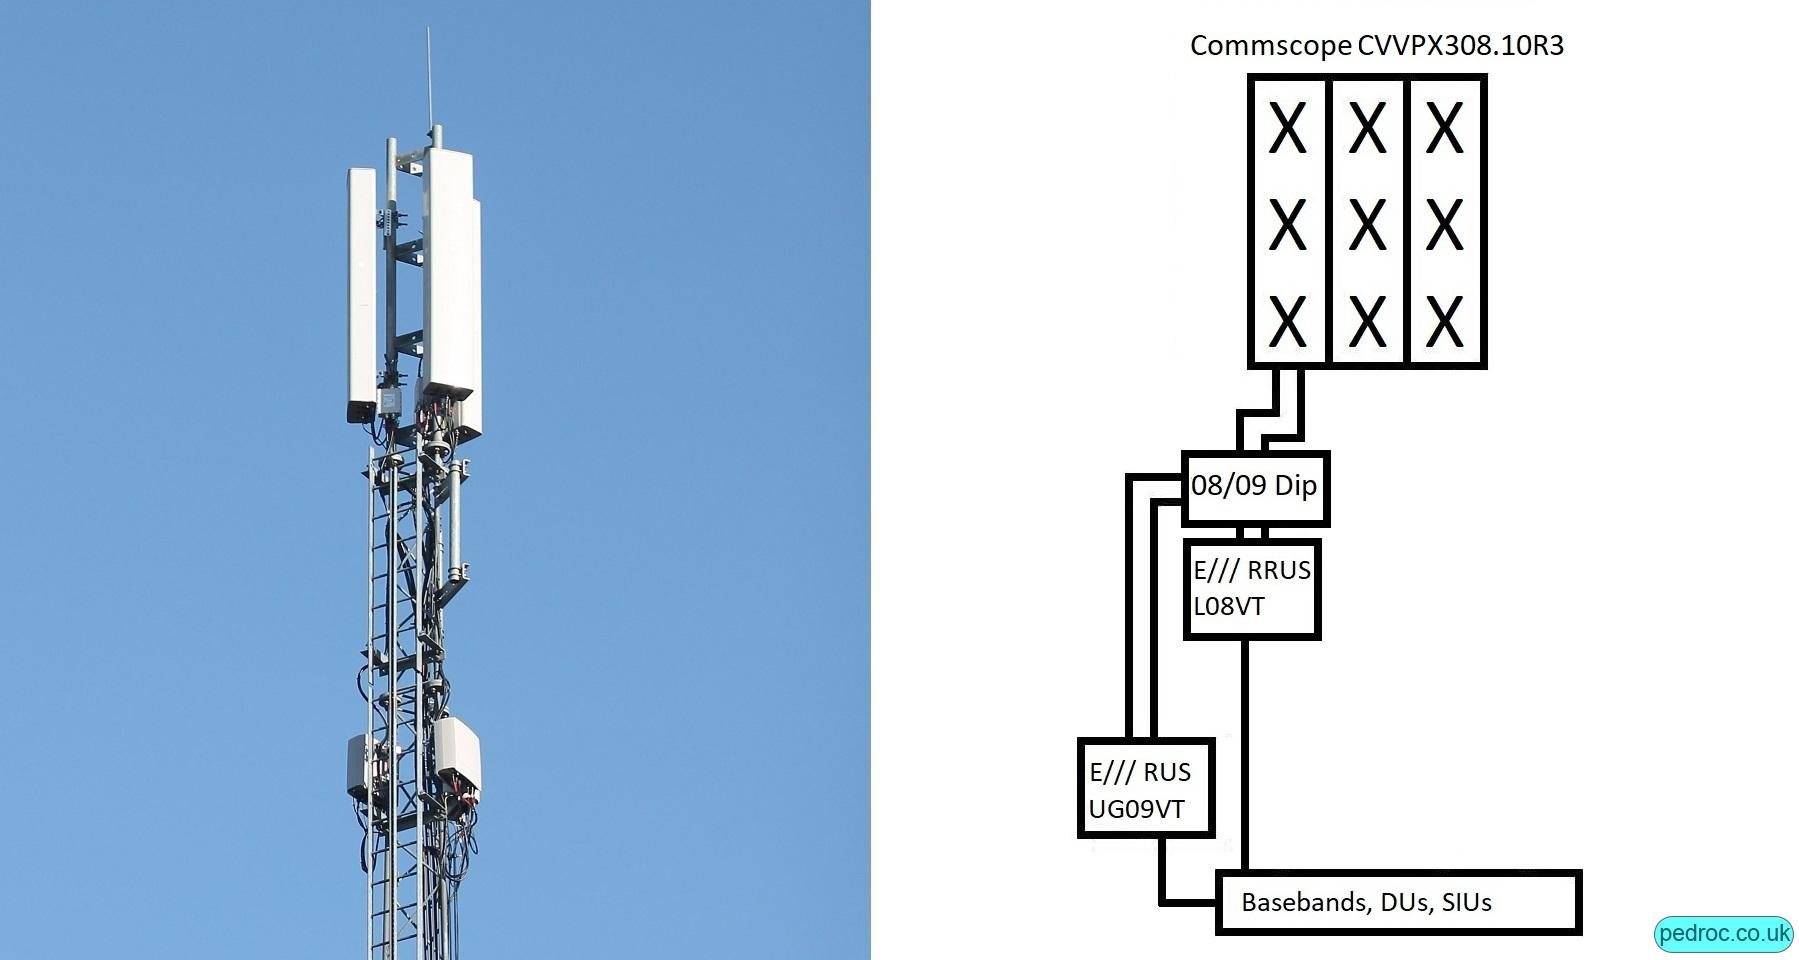 Commscope CVVPX308.10R3 antennas, Ericsson RRUS11, Vodafone low band, low capacity site.